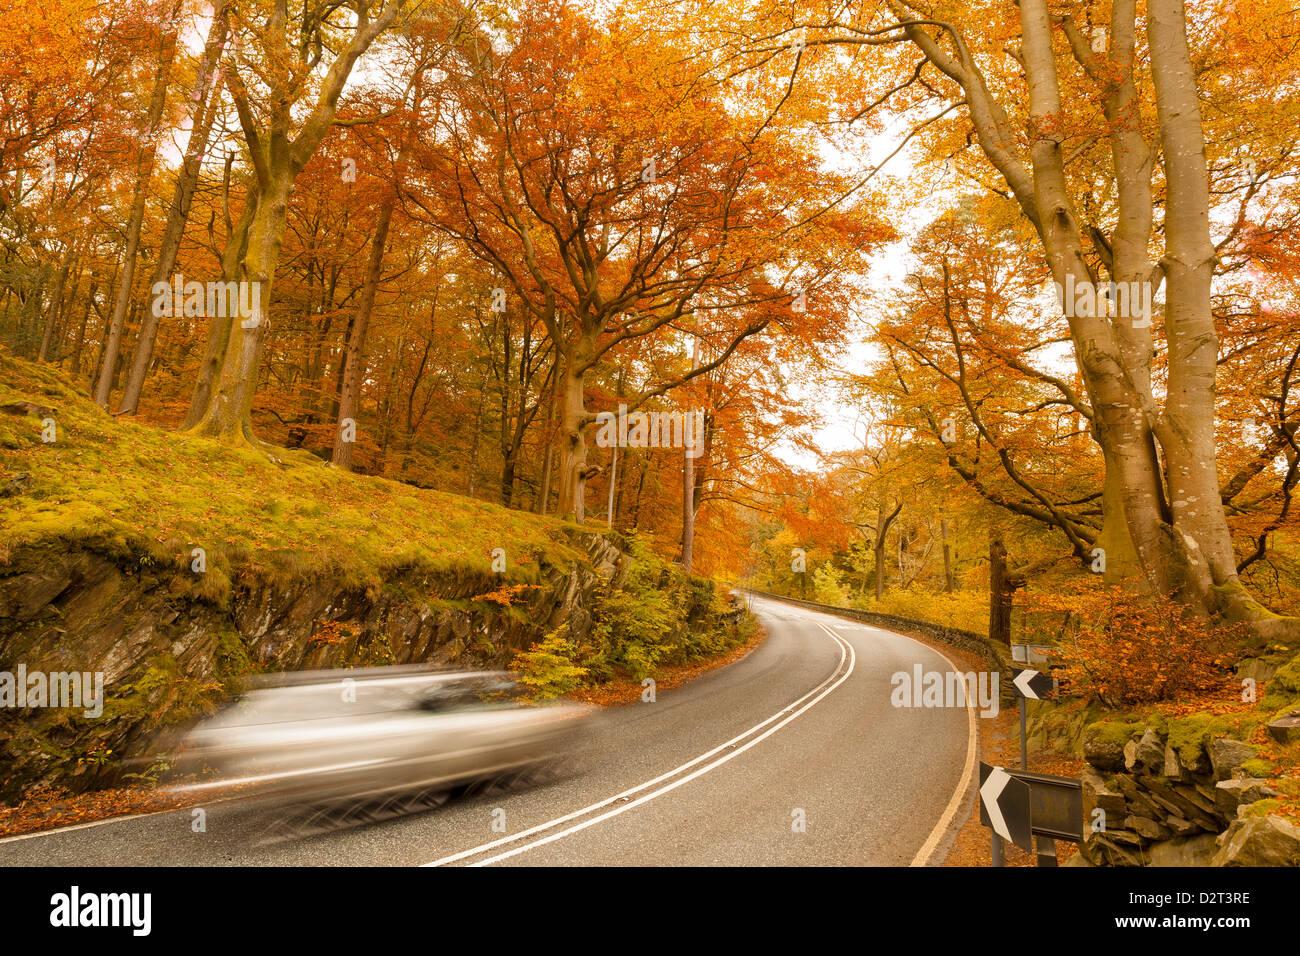 Car speeding through autumn forest road, Lake District National Park, Cumbria, England, United Kingdom, Europe - Stock Image